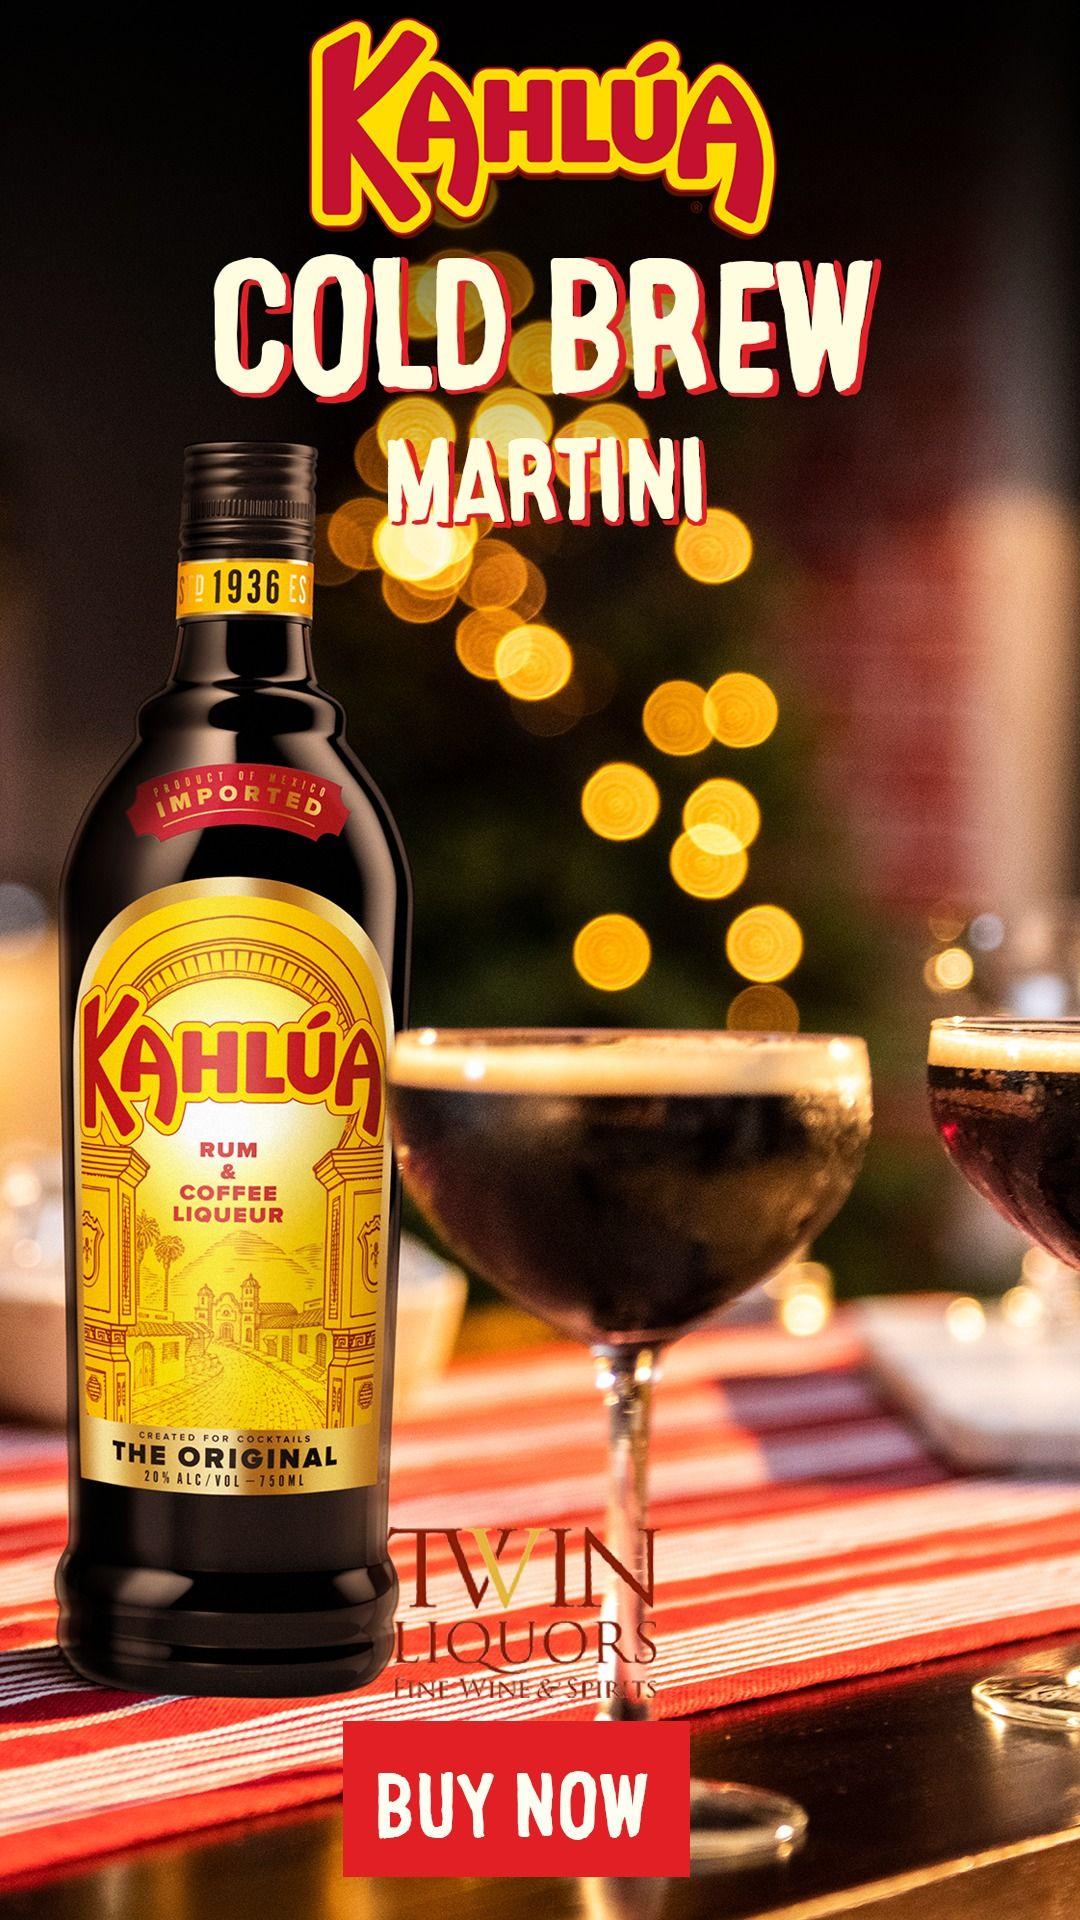 Kahlúa Cold Brew Martini Festive drinks, Kahlua, Drinks